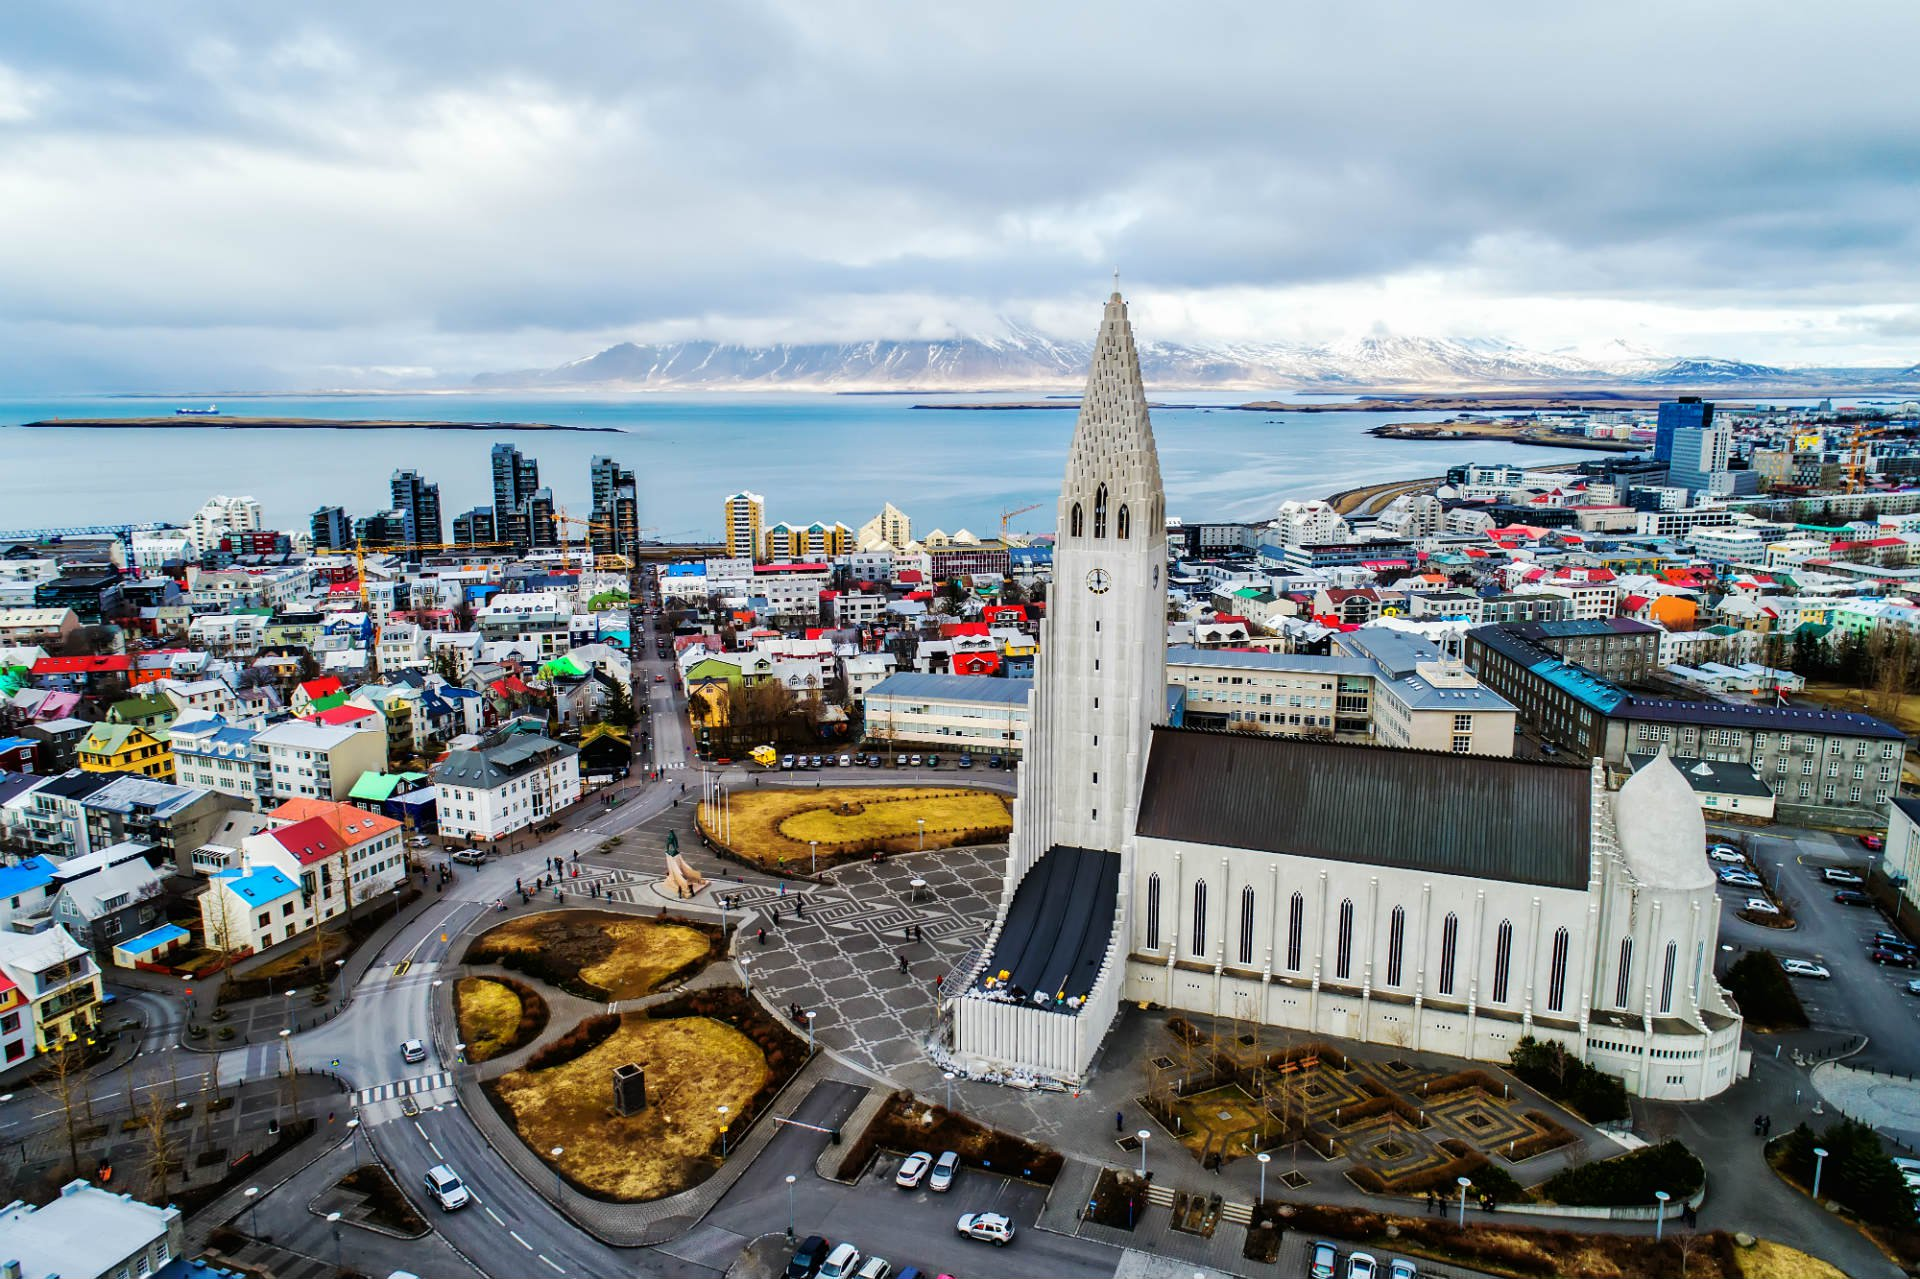 3 Nights in Reykjavik for £299